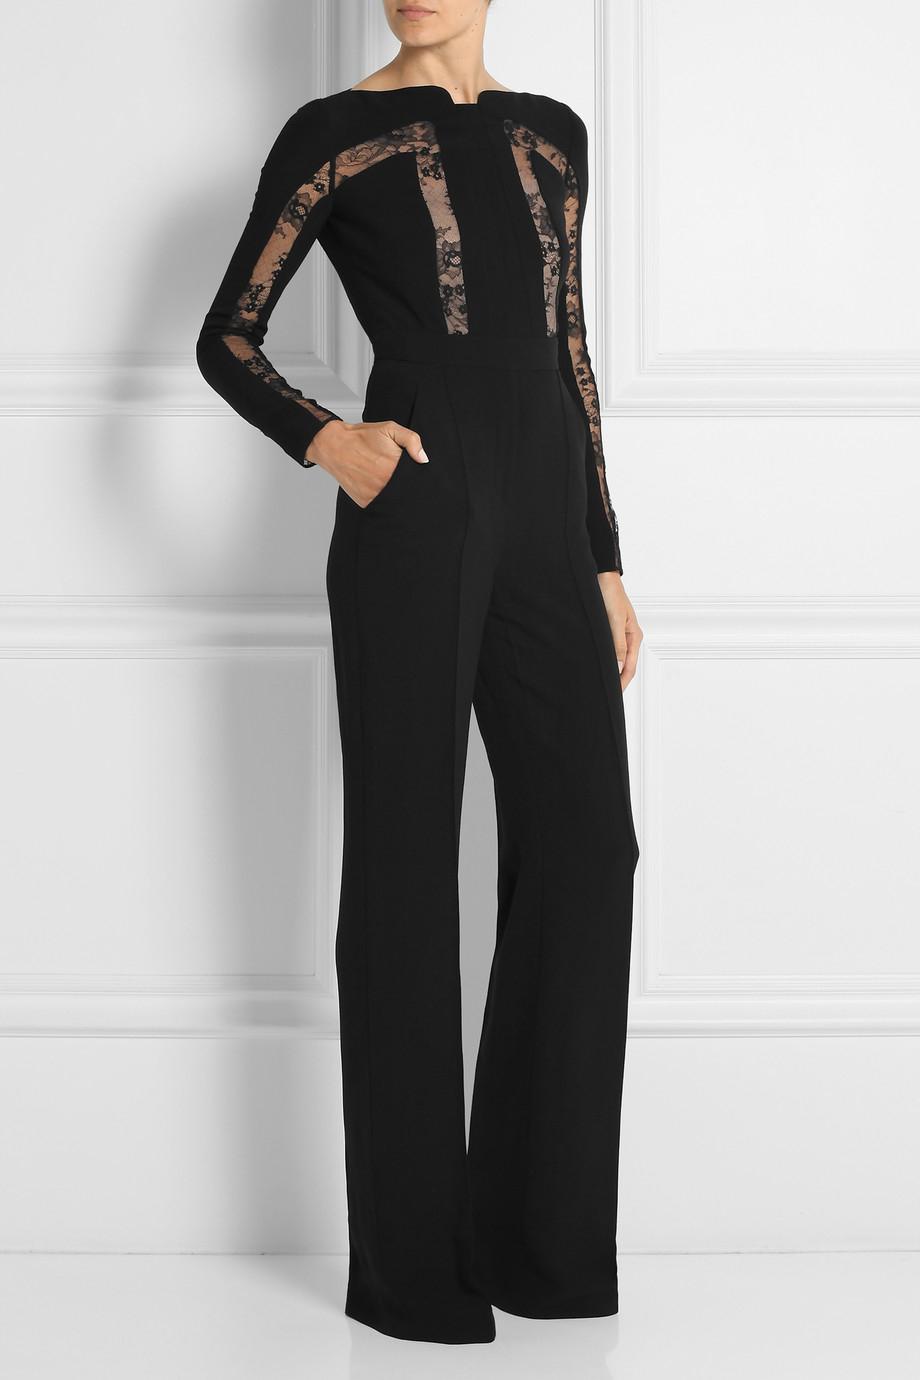 7c901abbb5f7 Lyst - Elie Saab Lace-Paneled Crepe Jumpsuit in Black